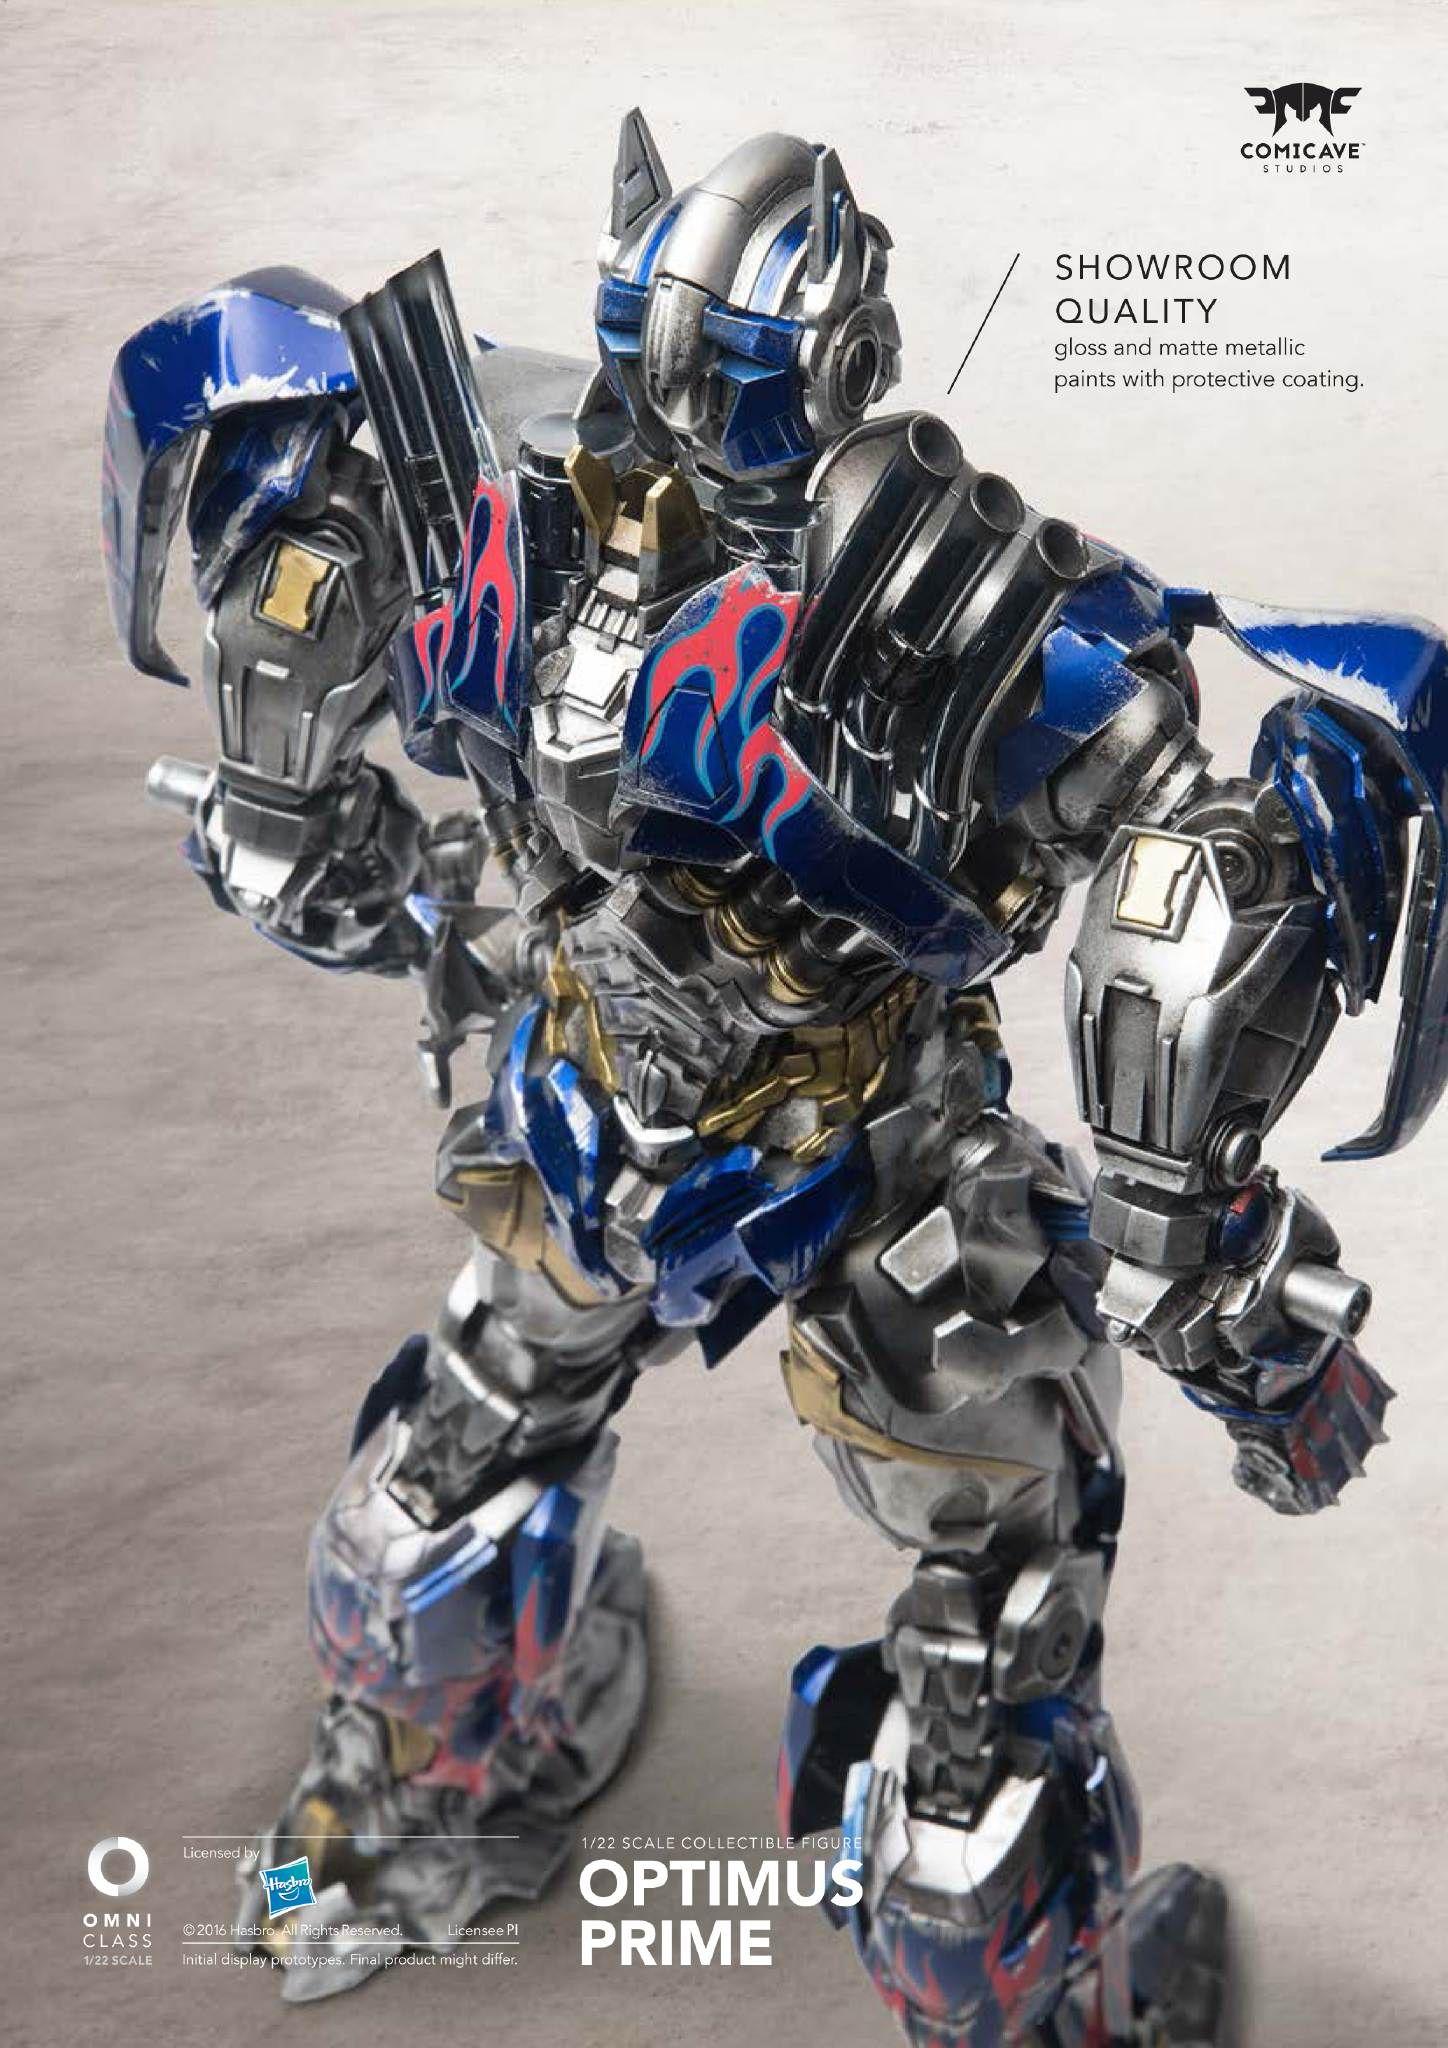 Pin By Rhonda Cutler On Robotics Armor Pinterest Transformers